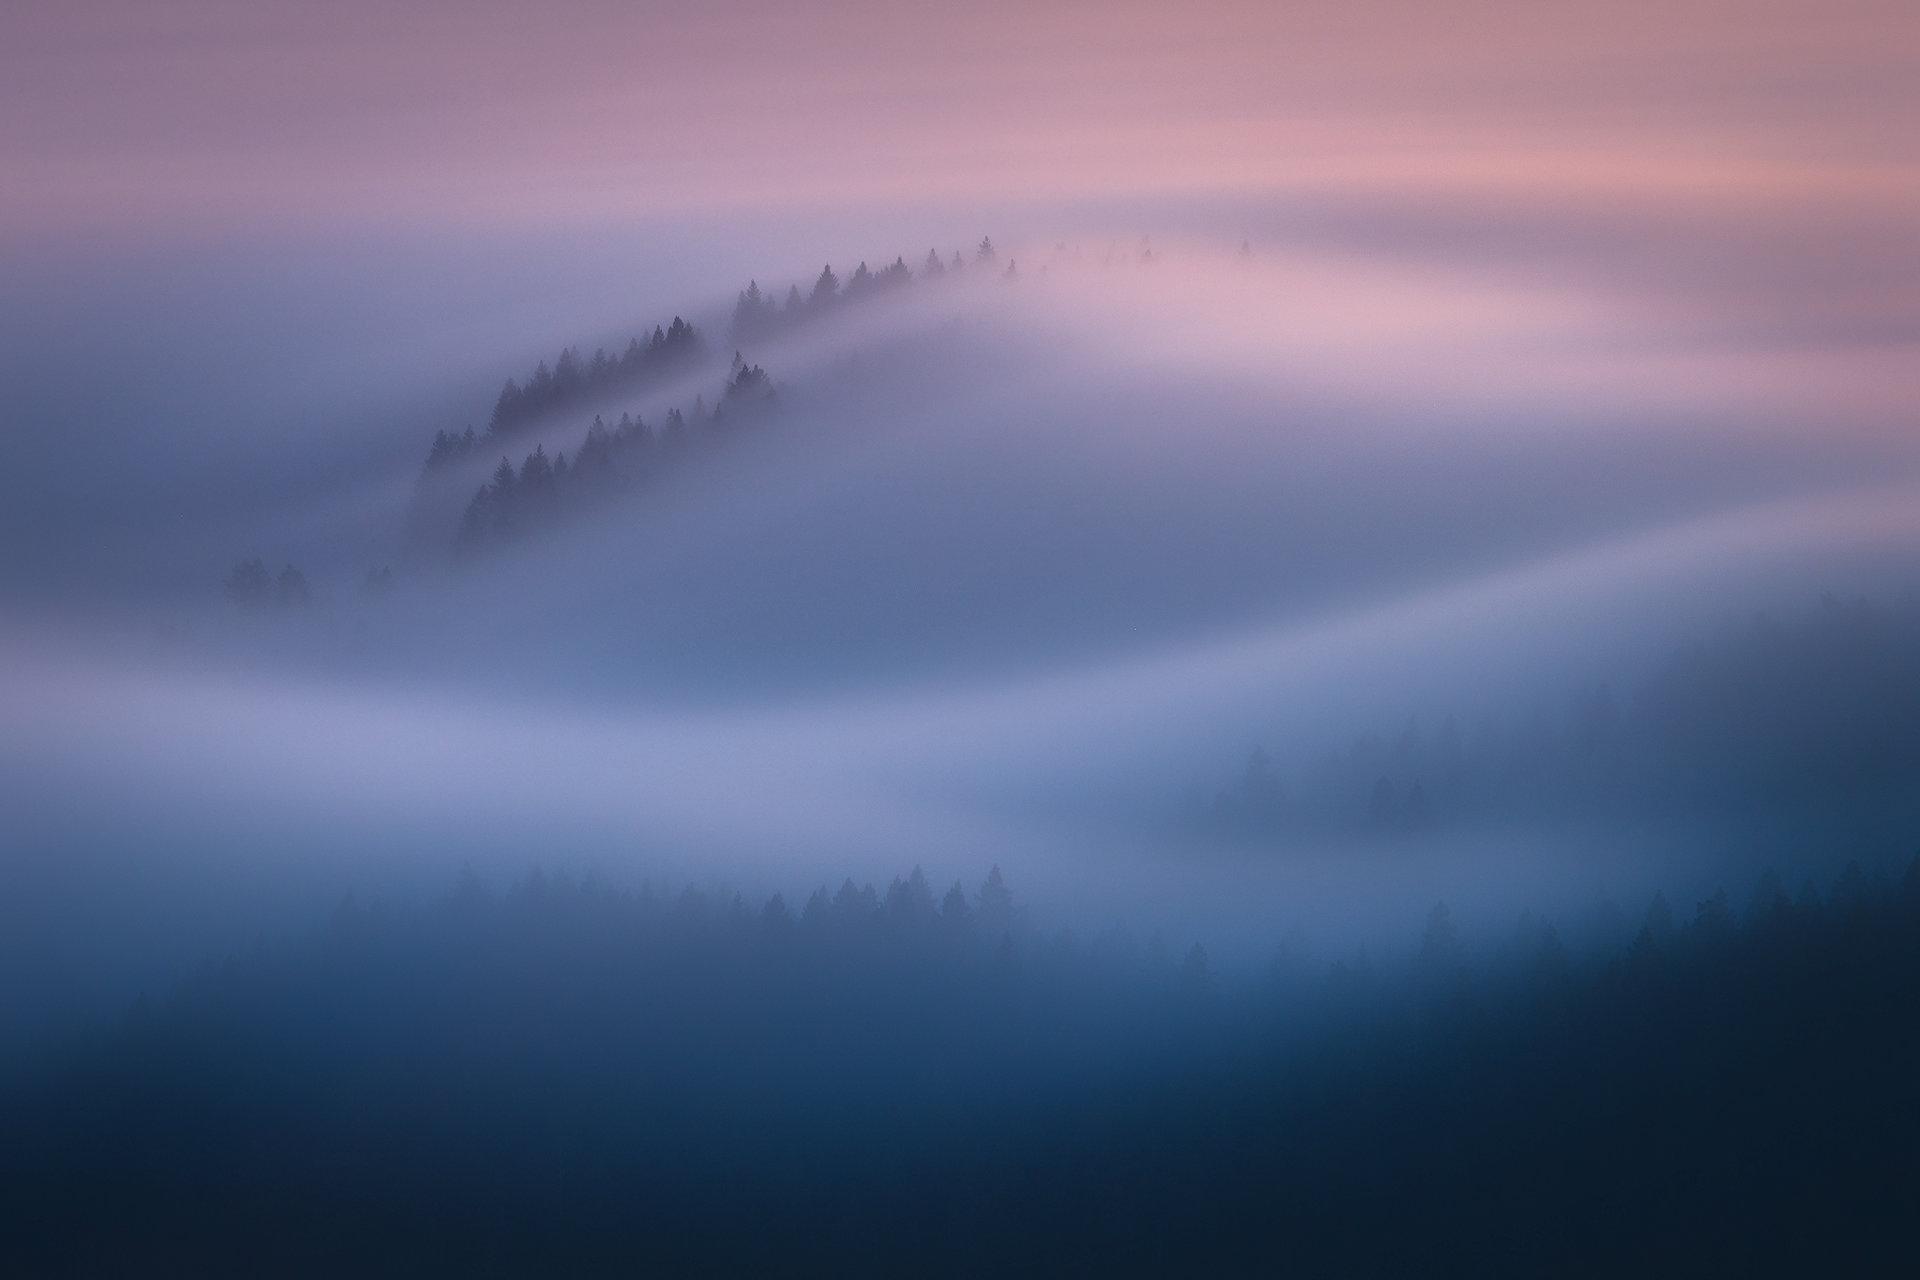 Karl the Fog 1/5 | Author Remo Daut - wallburn | PHOTO FORUM